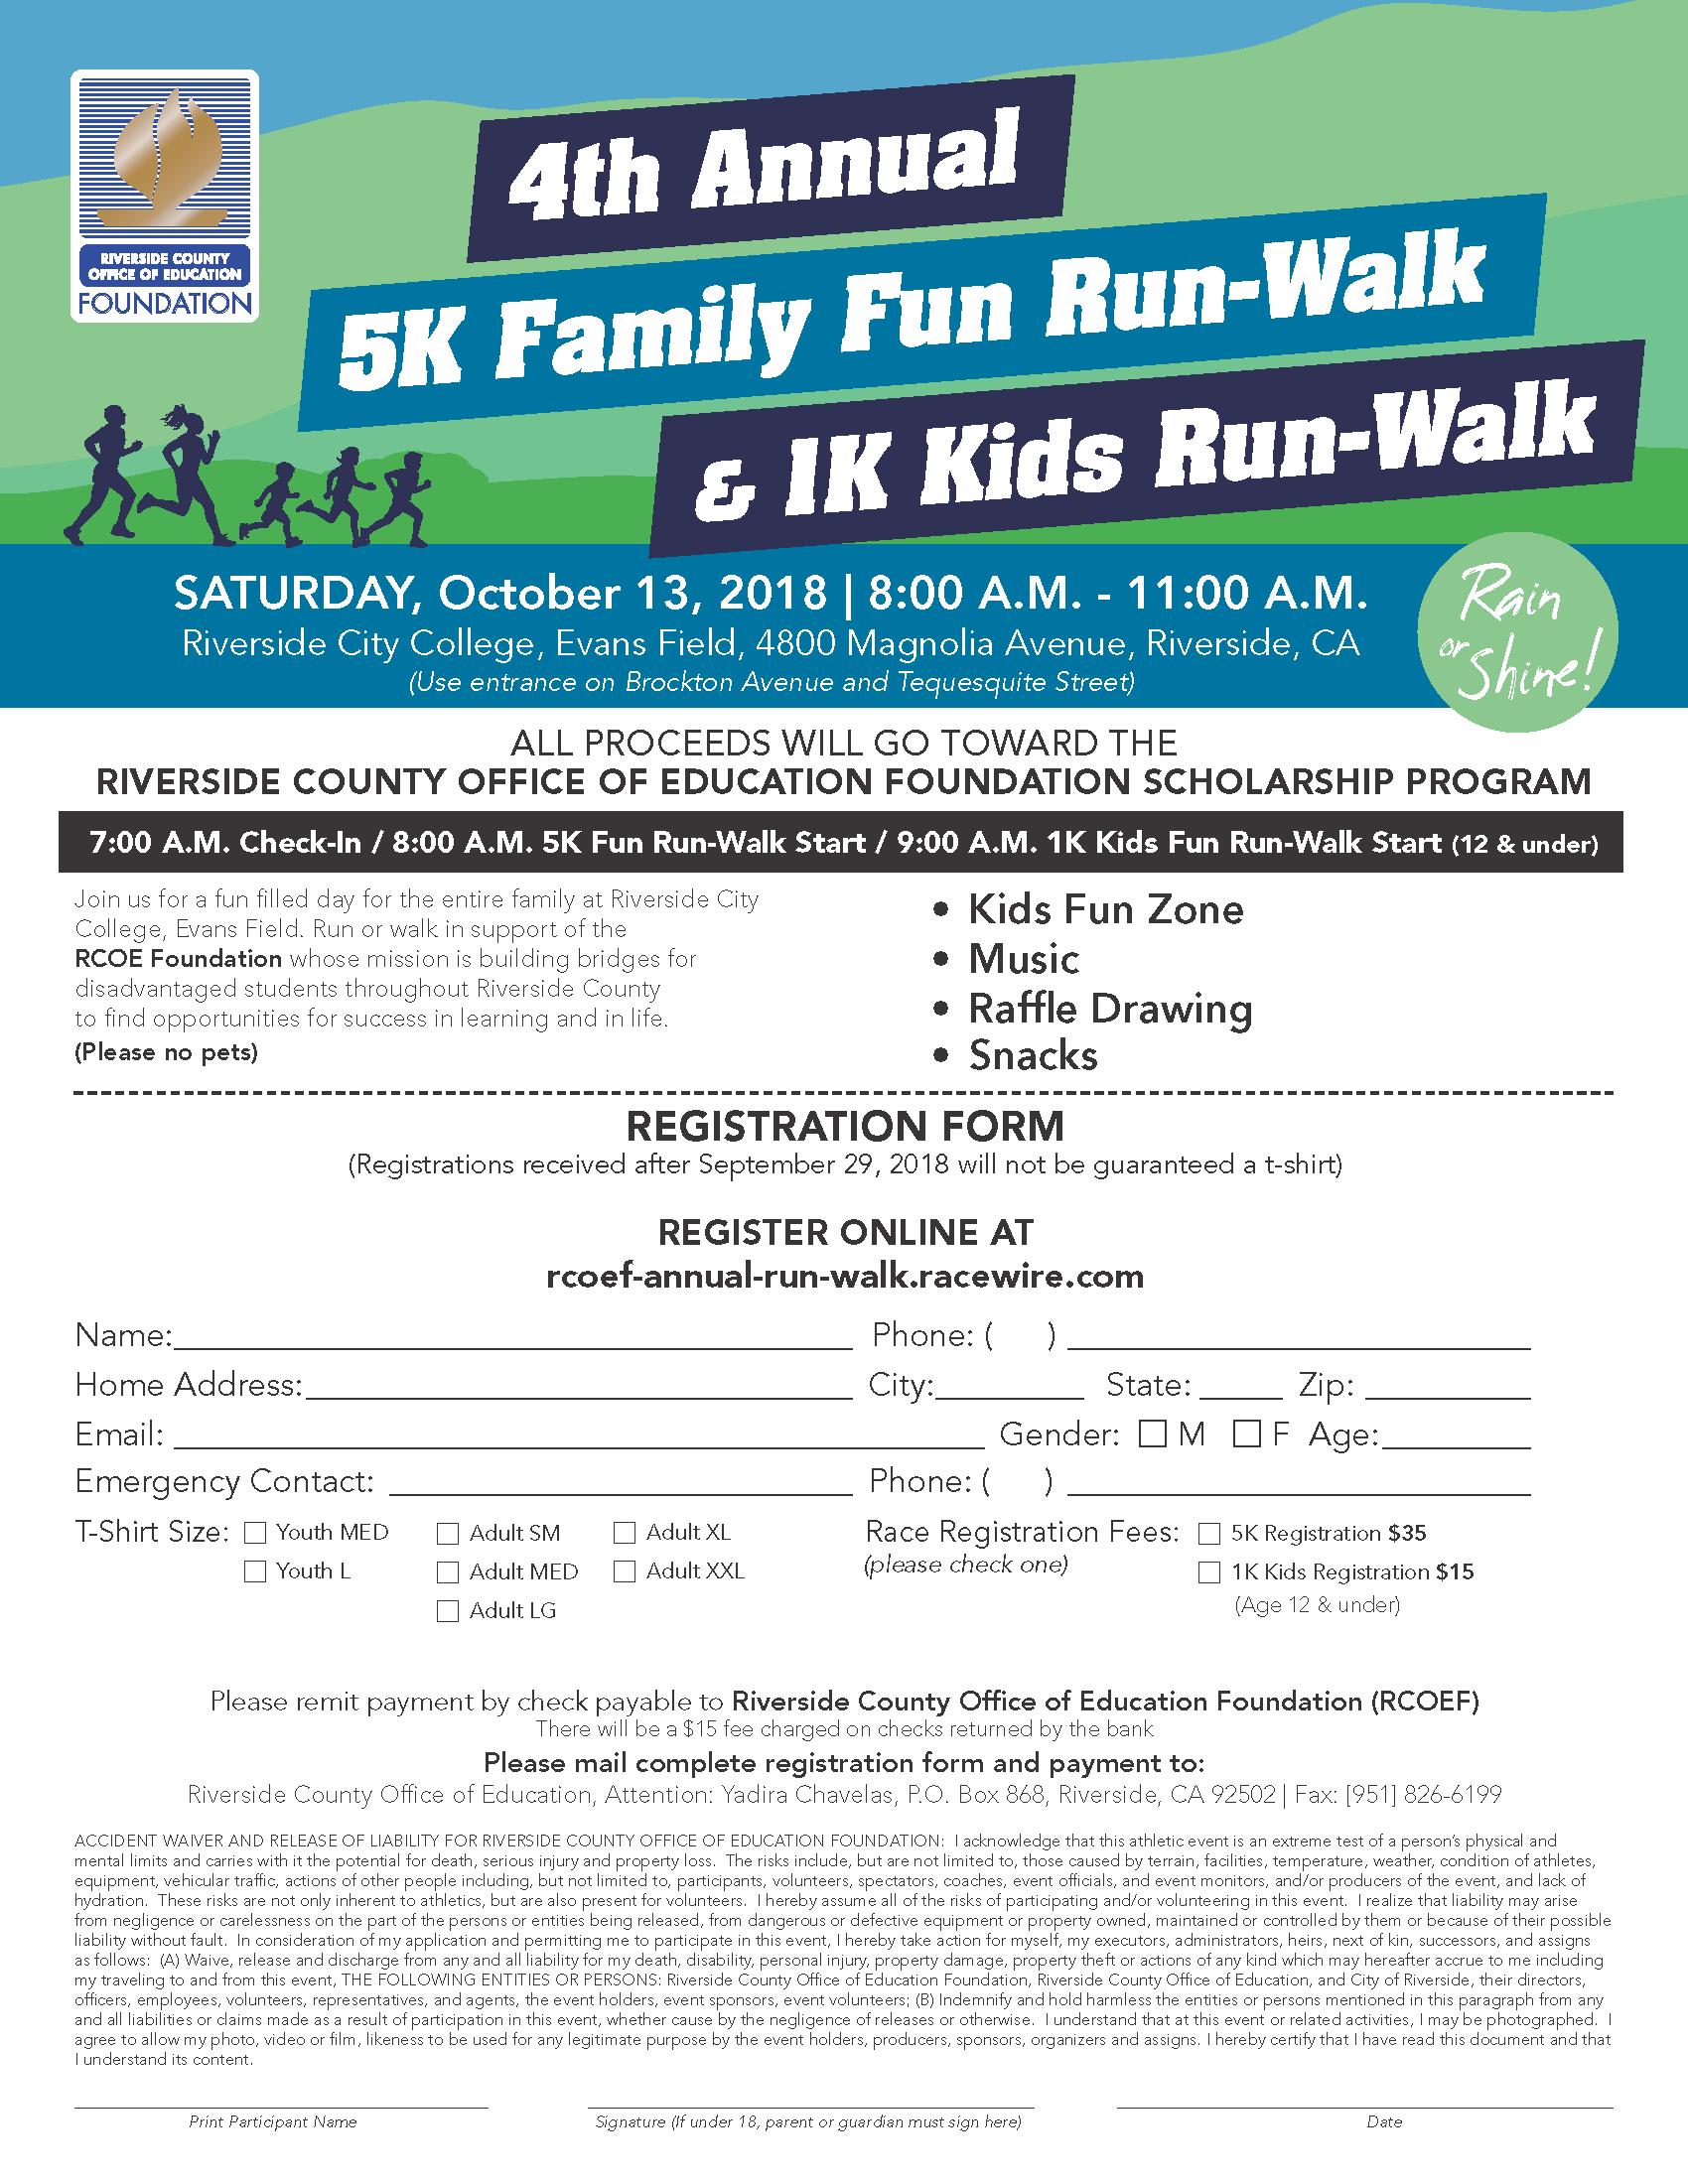 upcoming events rcoe presents 5k family fun run walk 100 mile club